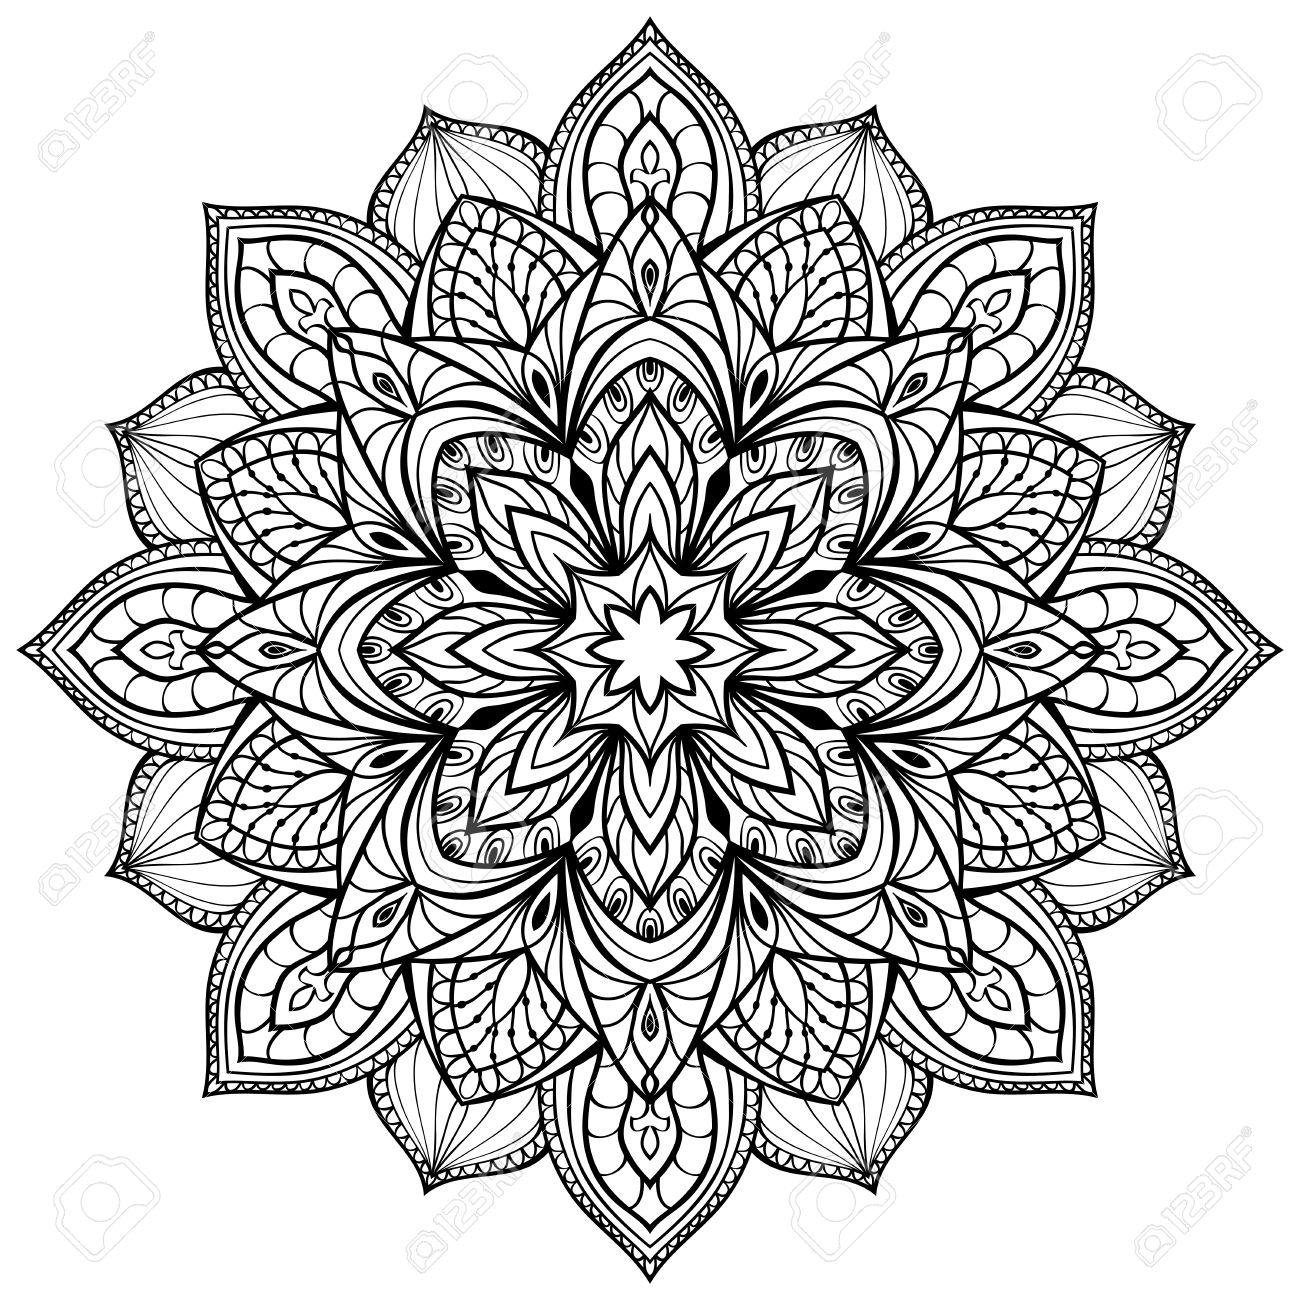 Vector Graphic Mandala Isolated On White Background The Stylized